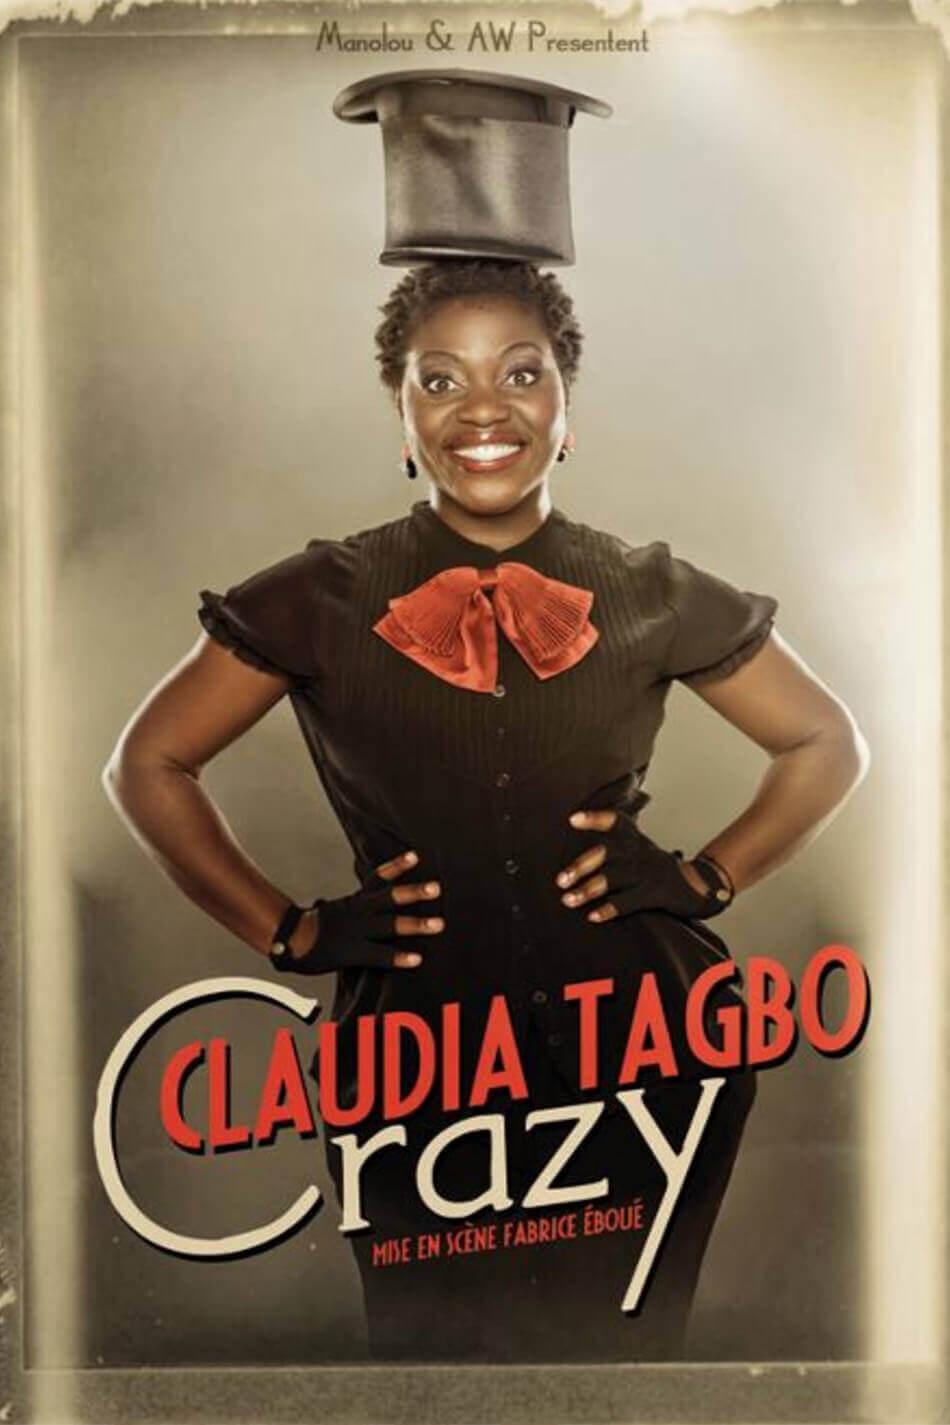 Claudia Tagbo crazy